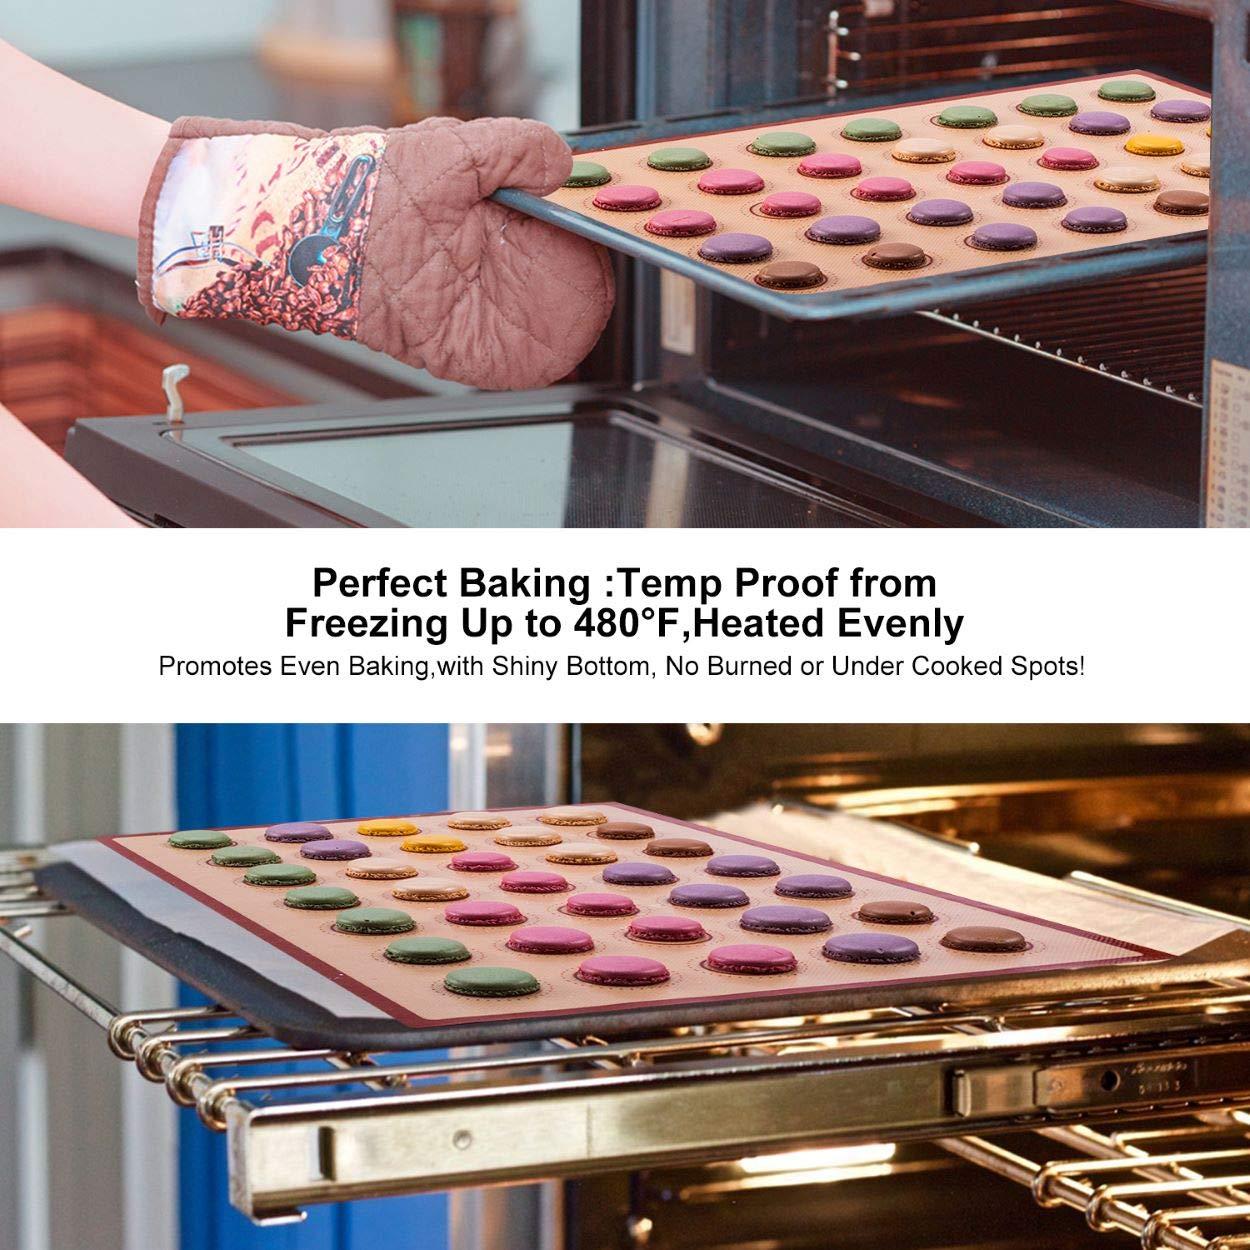 Silicone Baking Mat Macaron Mat Kit(14pcs set) Macaroon Baking Mat Set of 2 Half Sheet Macaron Silicone Mat Nonstick Macaron Mat Sheet,6 Piping Tip,2 Piping Bag with 2 Bag Tie,1 coupler (11.6''x16.5'') by Angadona (Image #4)